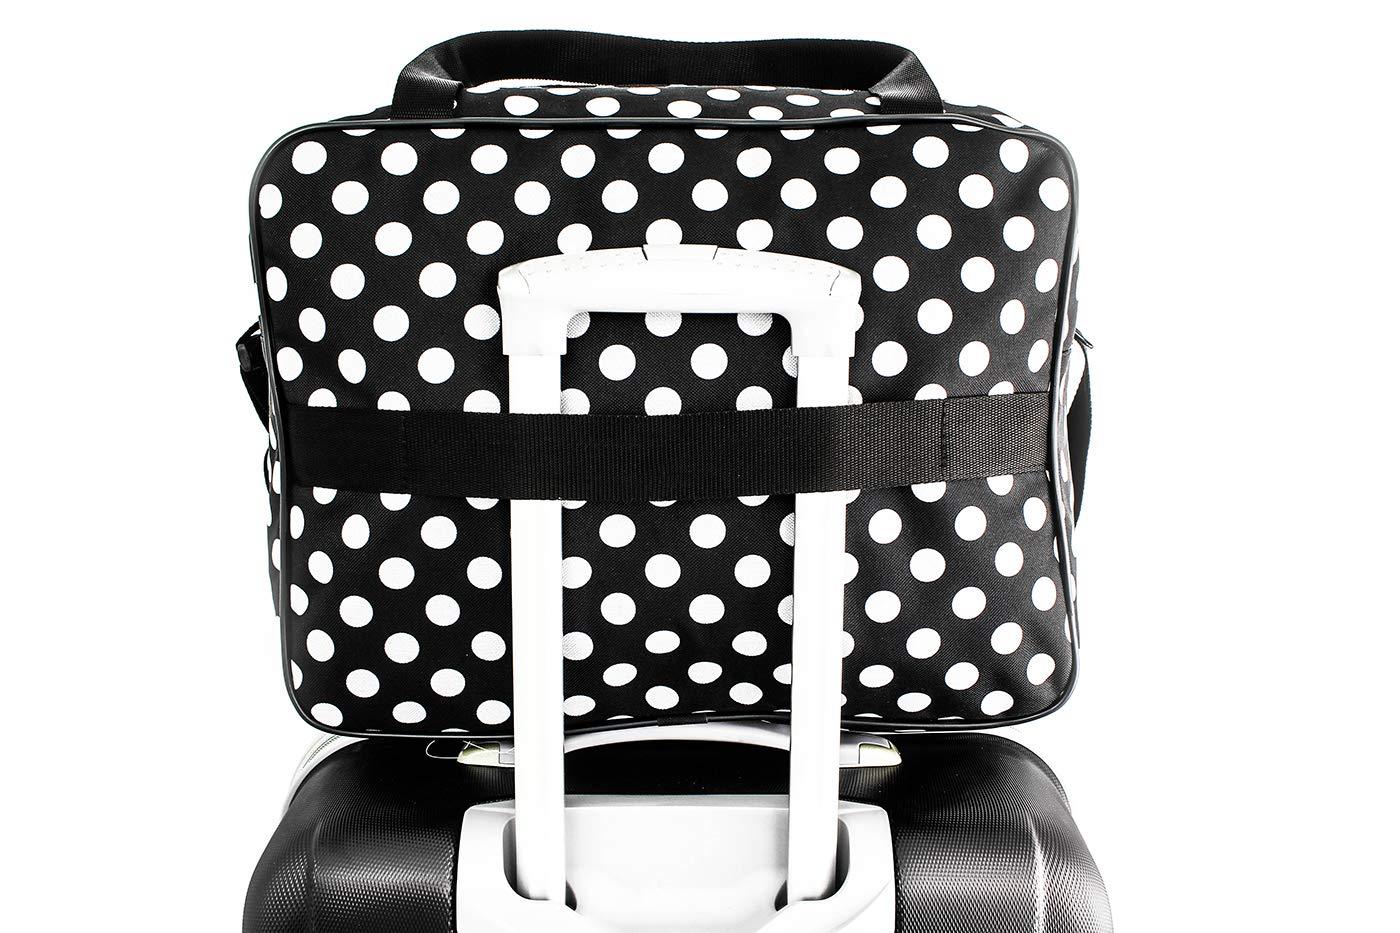 Ryanair-Cabin-Bag-40x20x25-Free-Handbag-Suitcase-Luggage-Tasche-Handgepck